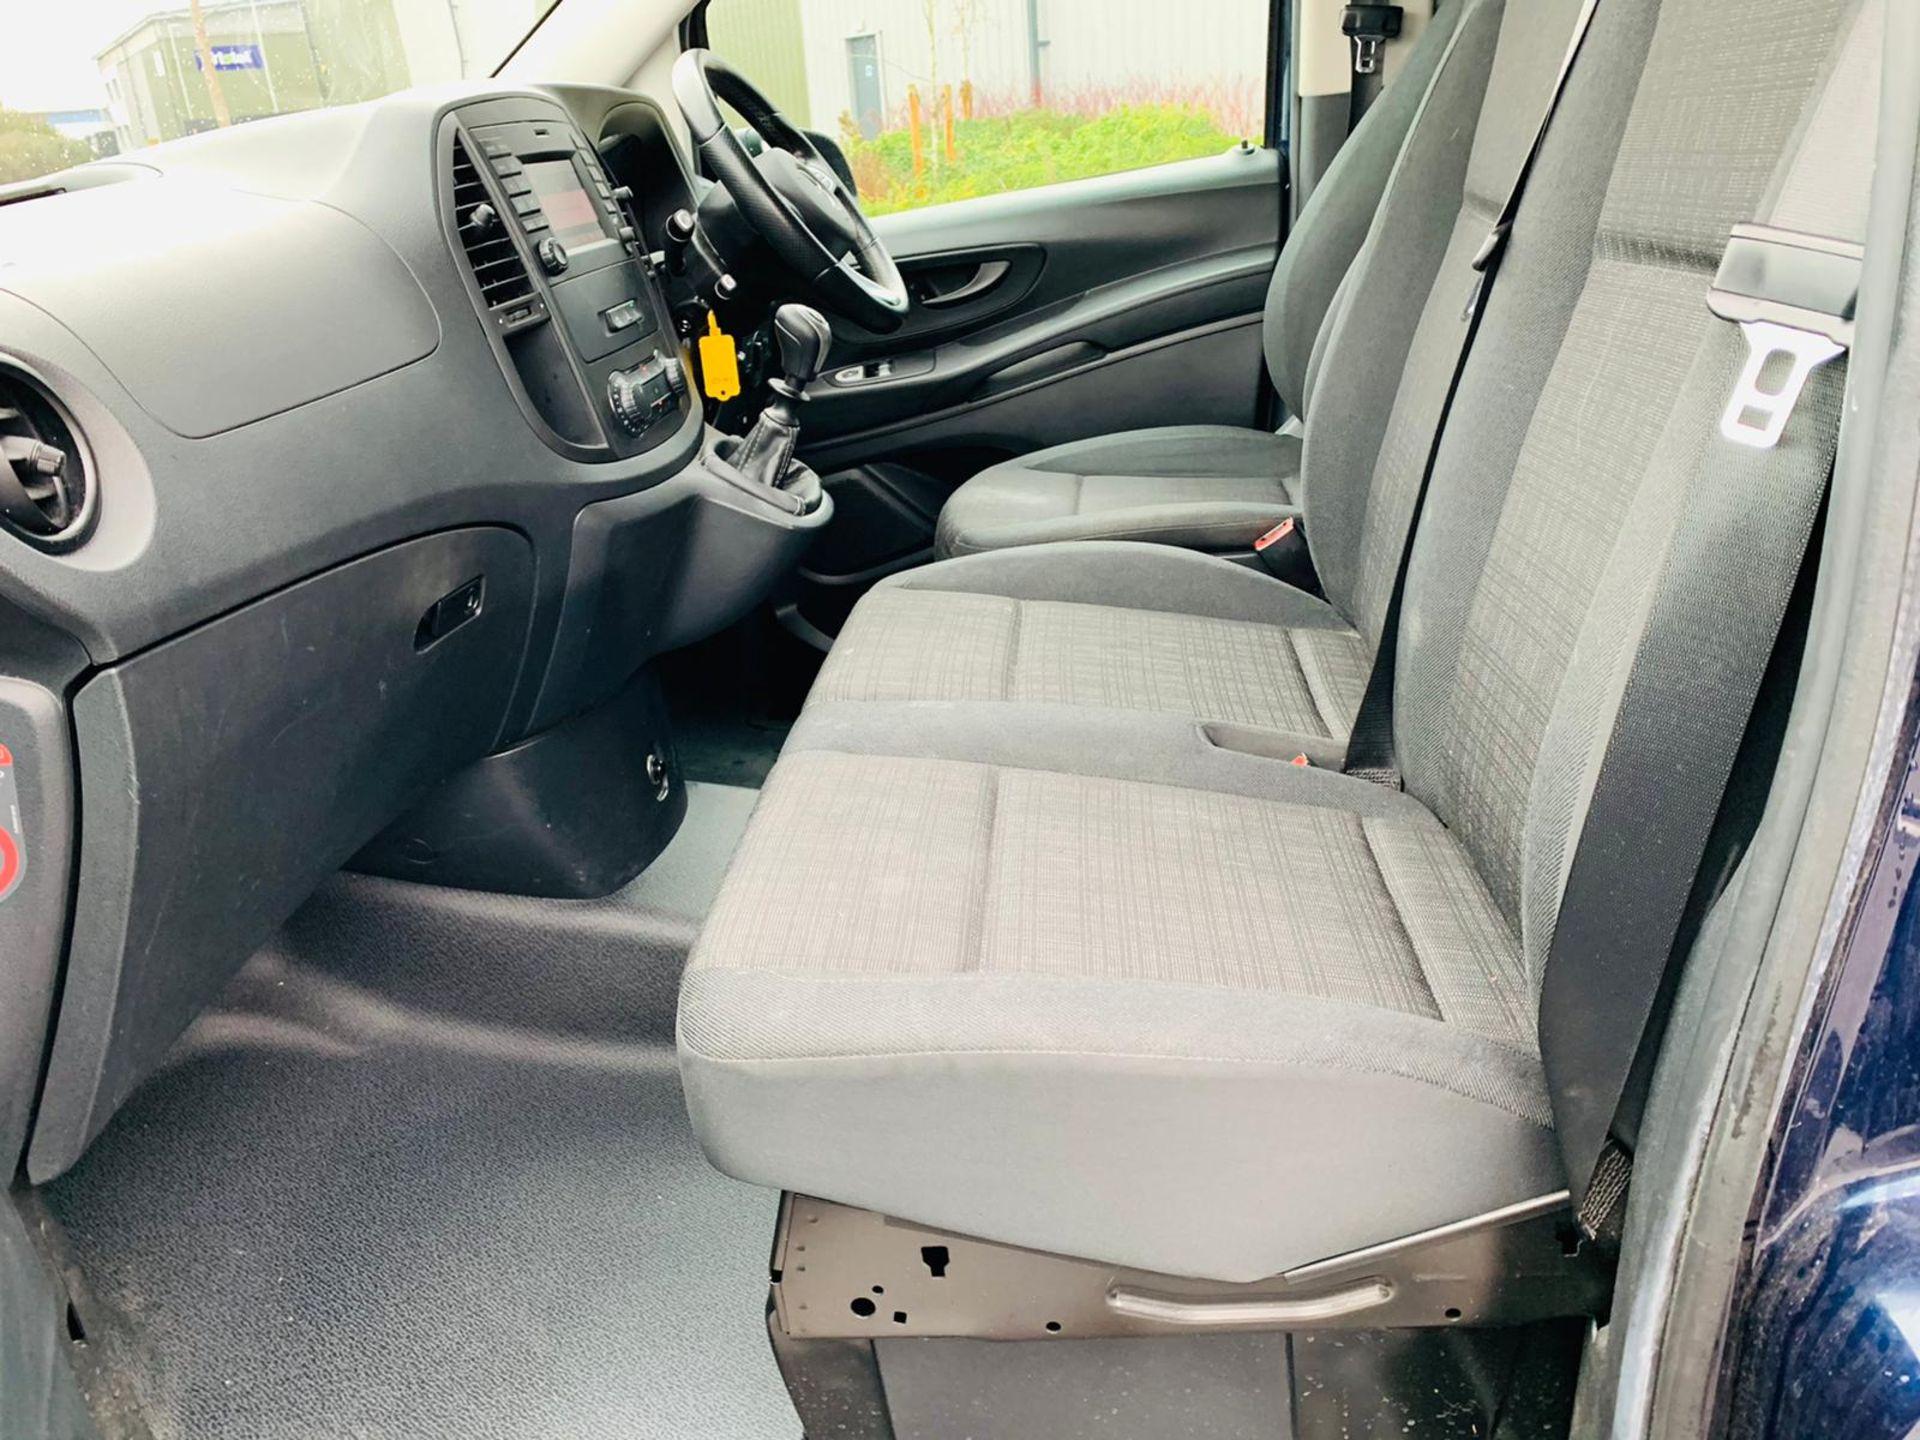 (RESERVE MET) Mercedes Vito 116Cdi Sporty Spec (161 BHP) Bluetech 6 Speed Van - 2016 Model - AC - Image 15 of 28